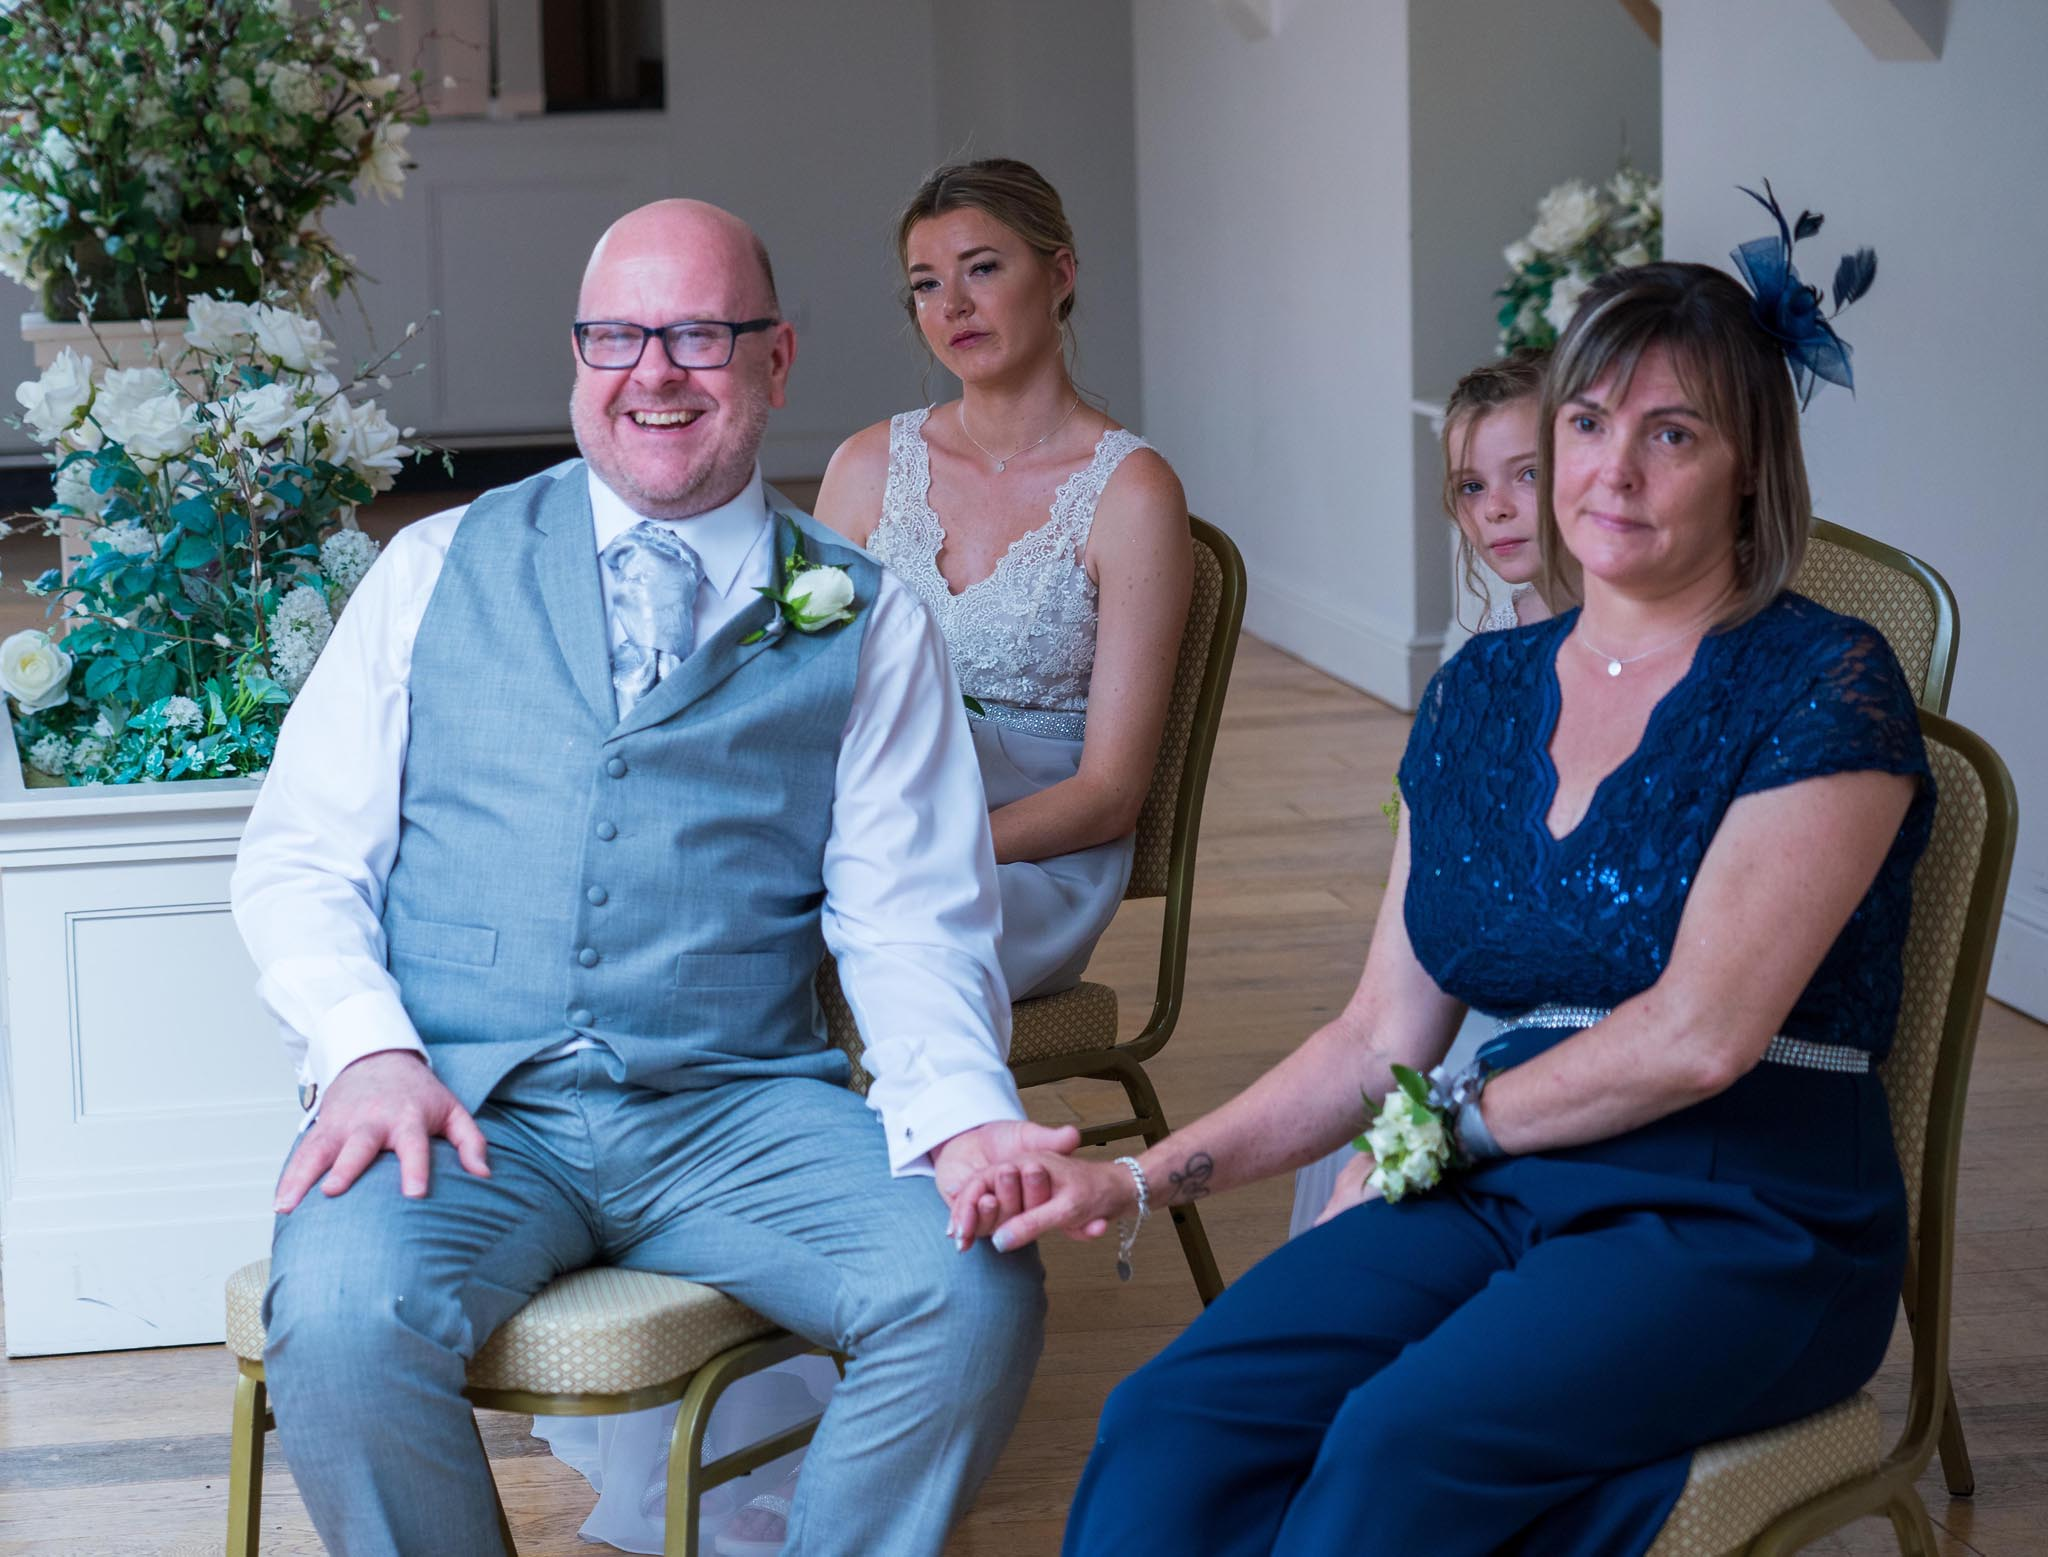 333-Ceremony-Luke-Yasmin-The-Rayleigh-Club-Wedding-Photography.jpg